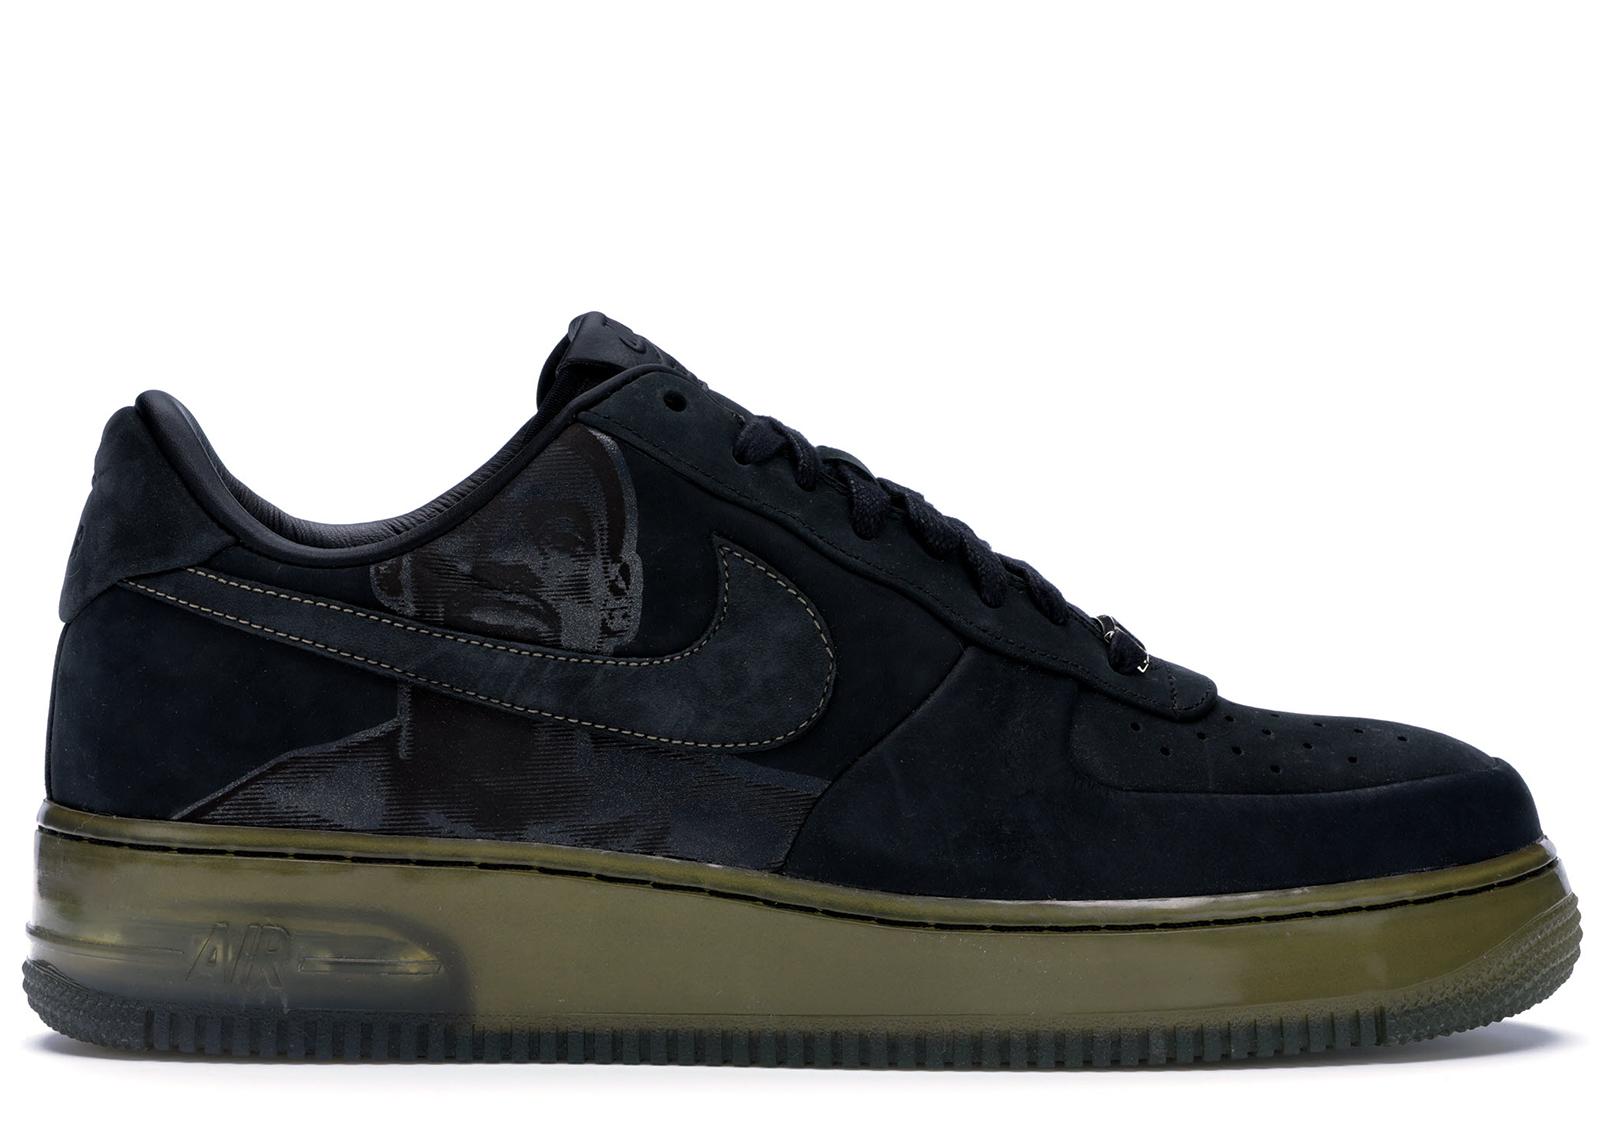 Nike Air Force 1 Low Supreme New Six